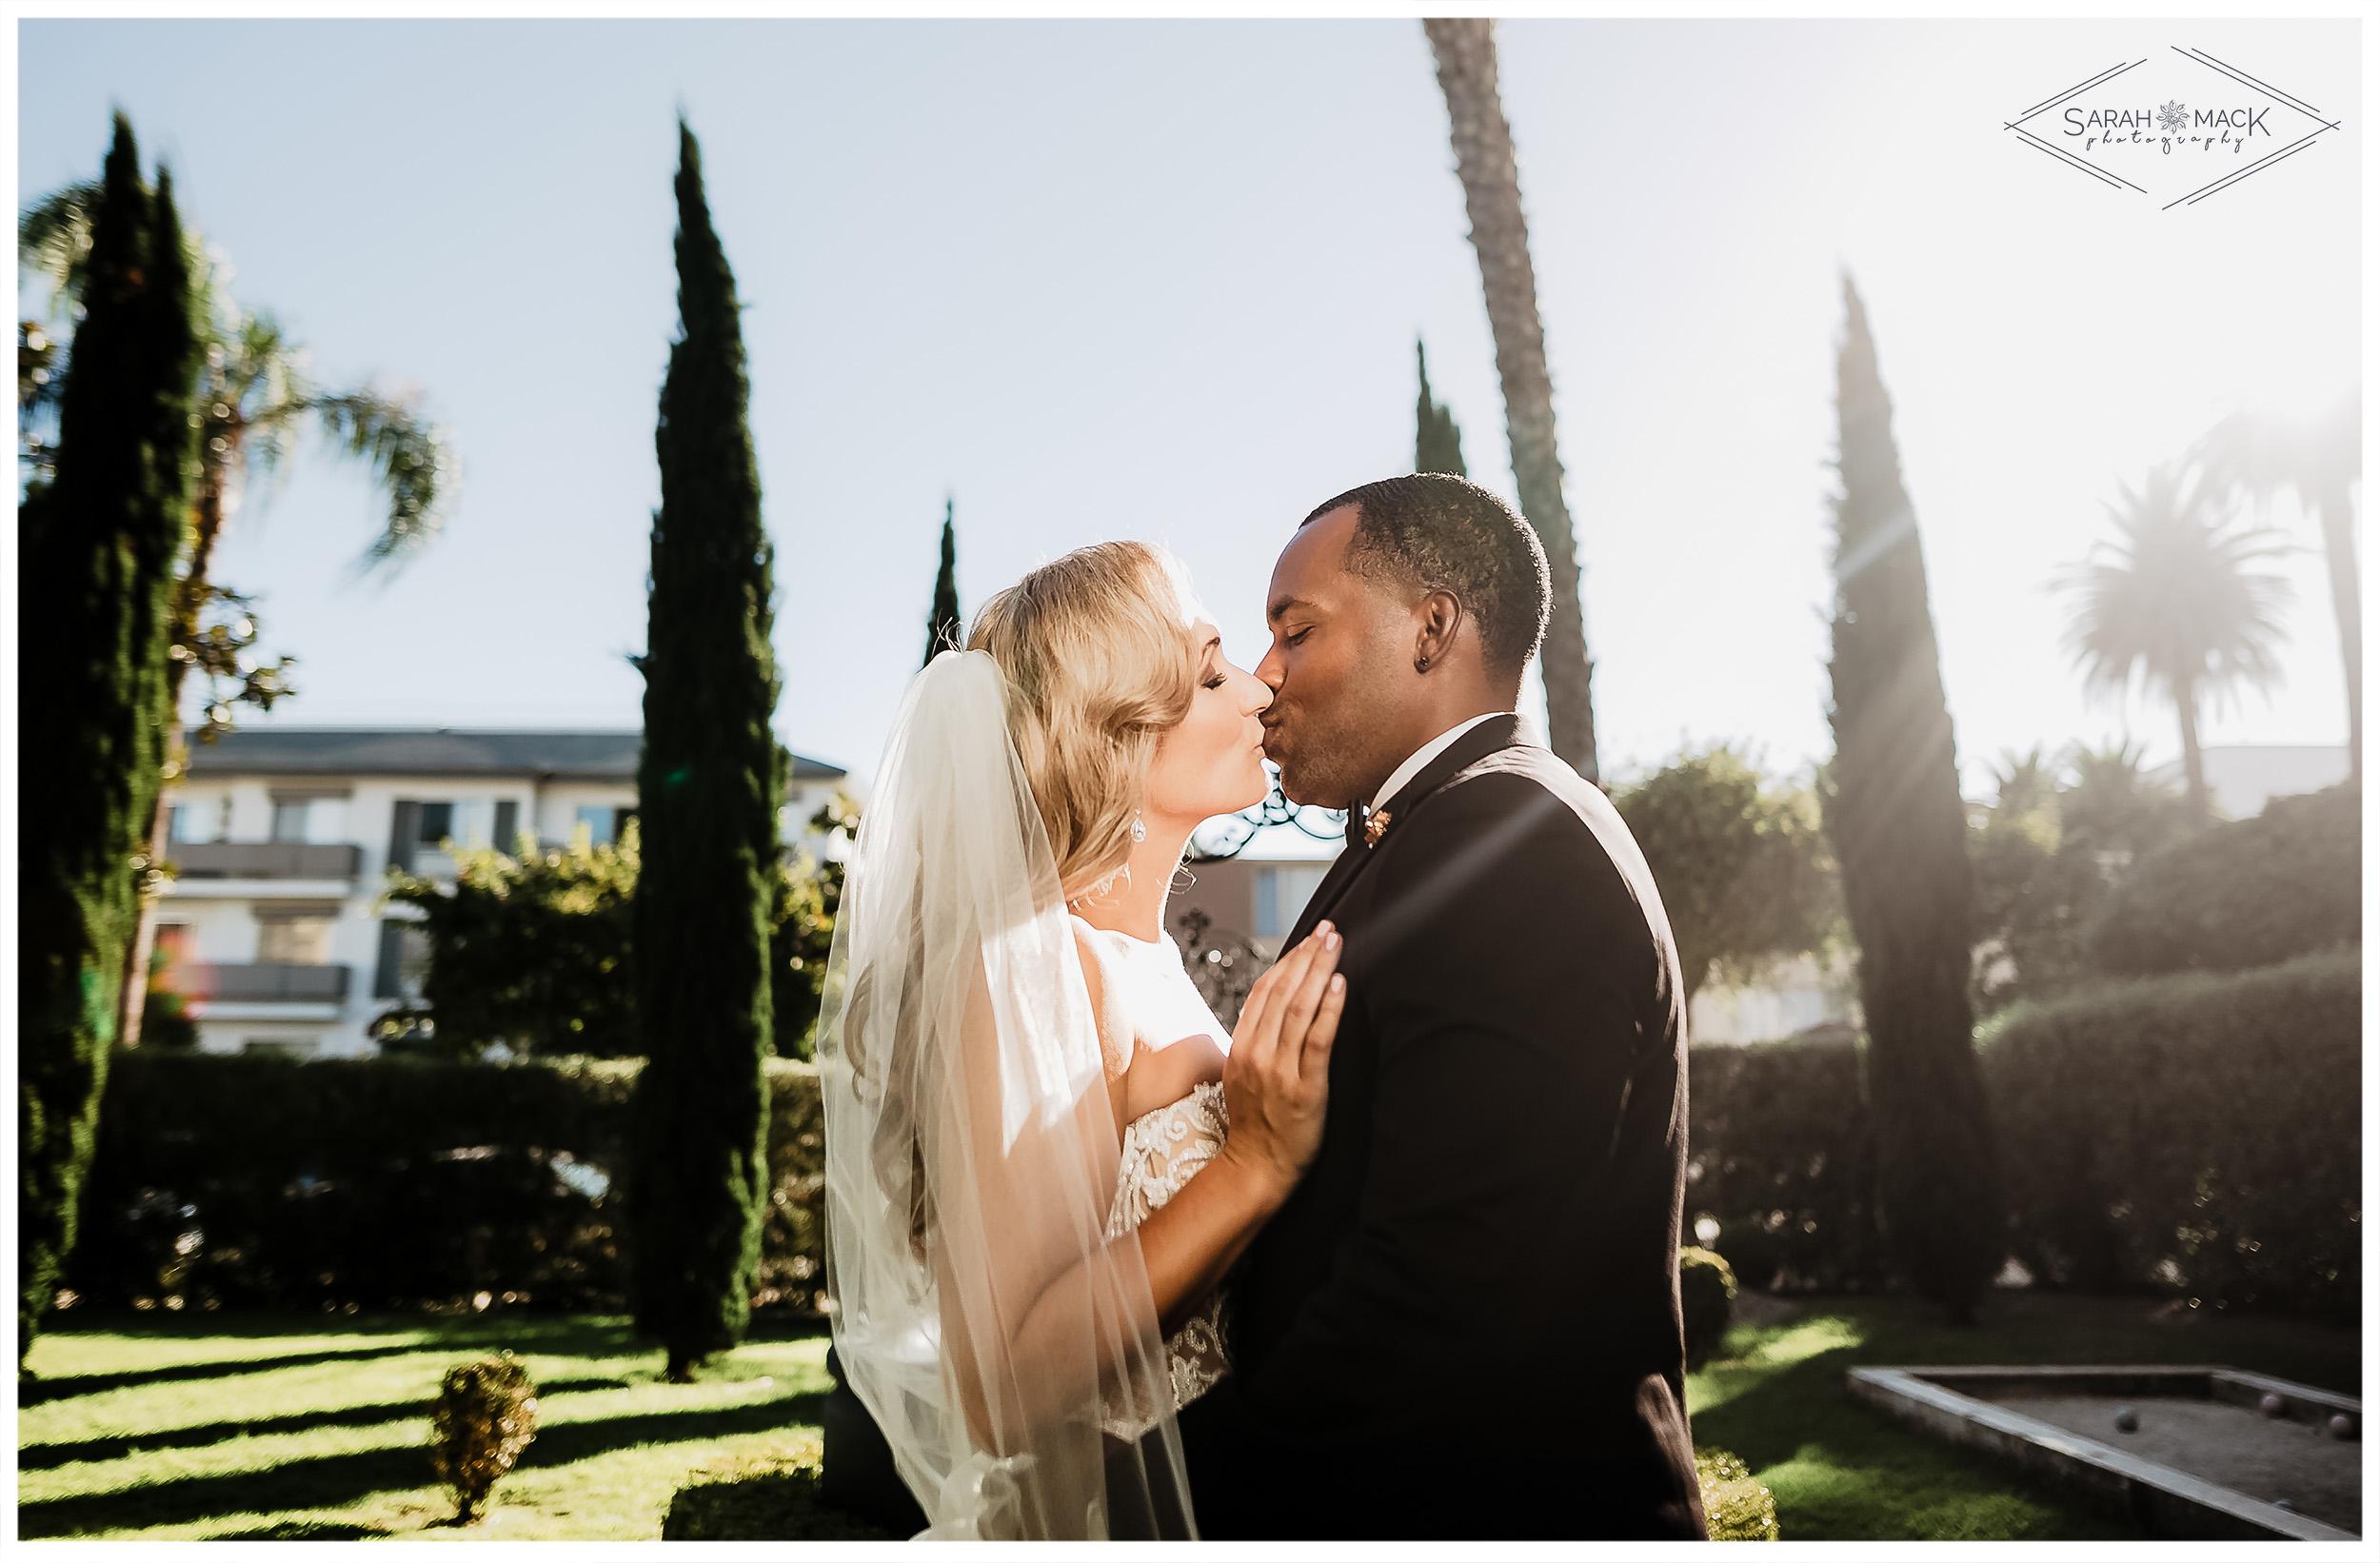 MK-Santa-Monica-Catholic-Church-Wedding-Photography-44.jpg